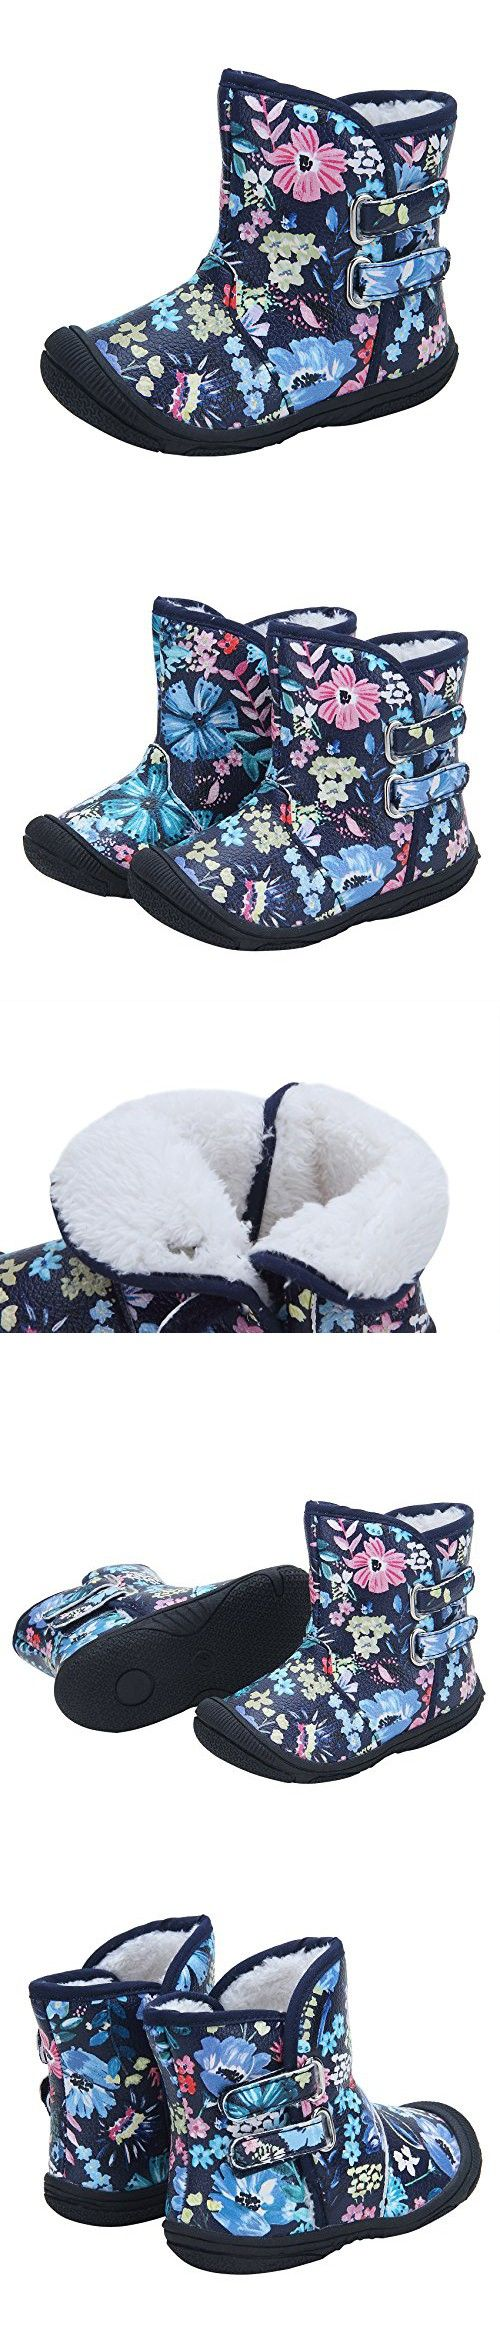 Kuner Baby Girls PU Leather Faux Fleece Rubber Soles Outdoor Warm Snow Boots (13.5cm(12-18months), Black Flowers)